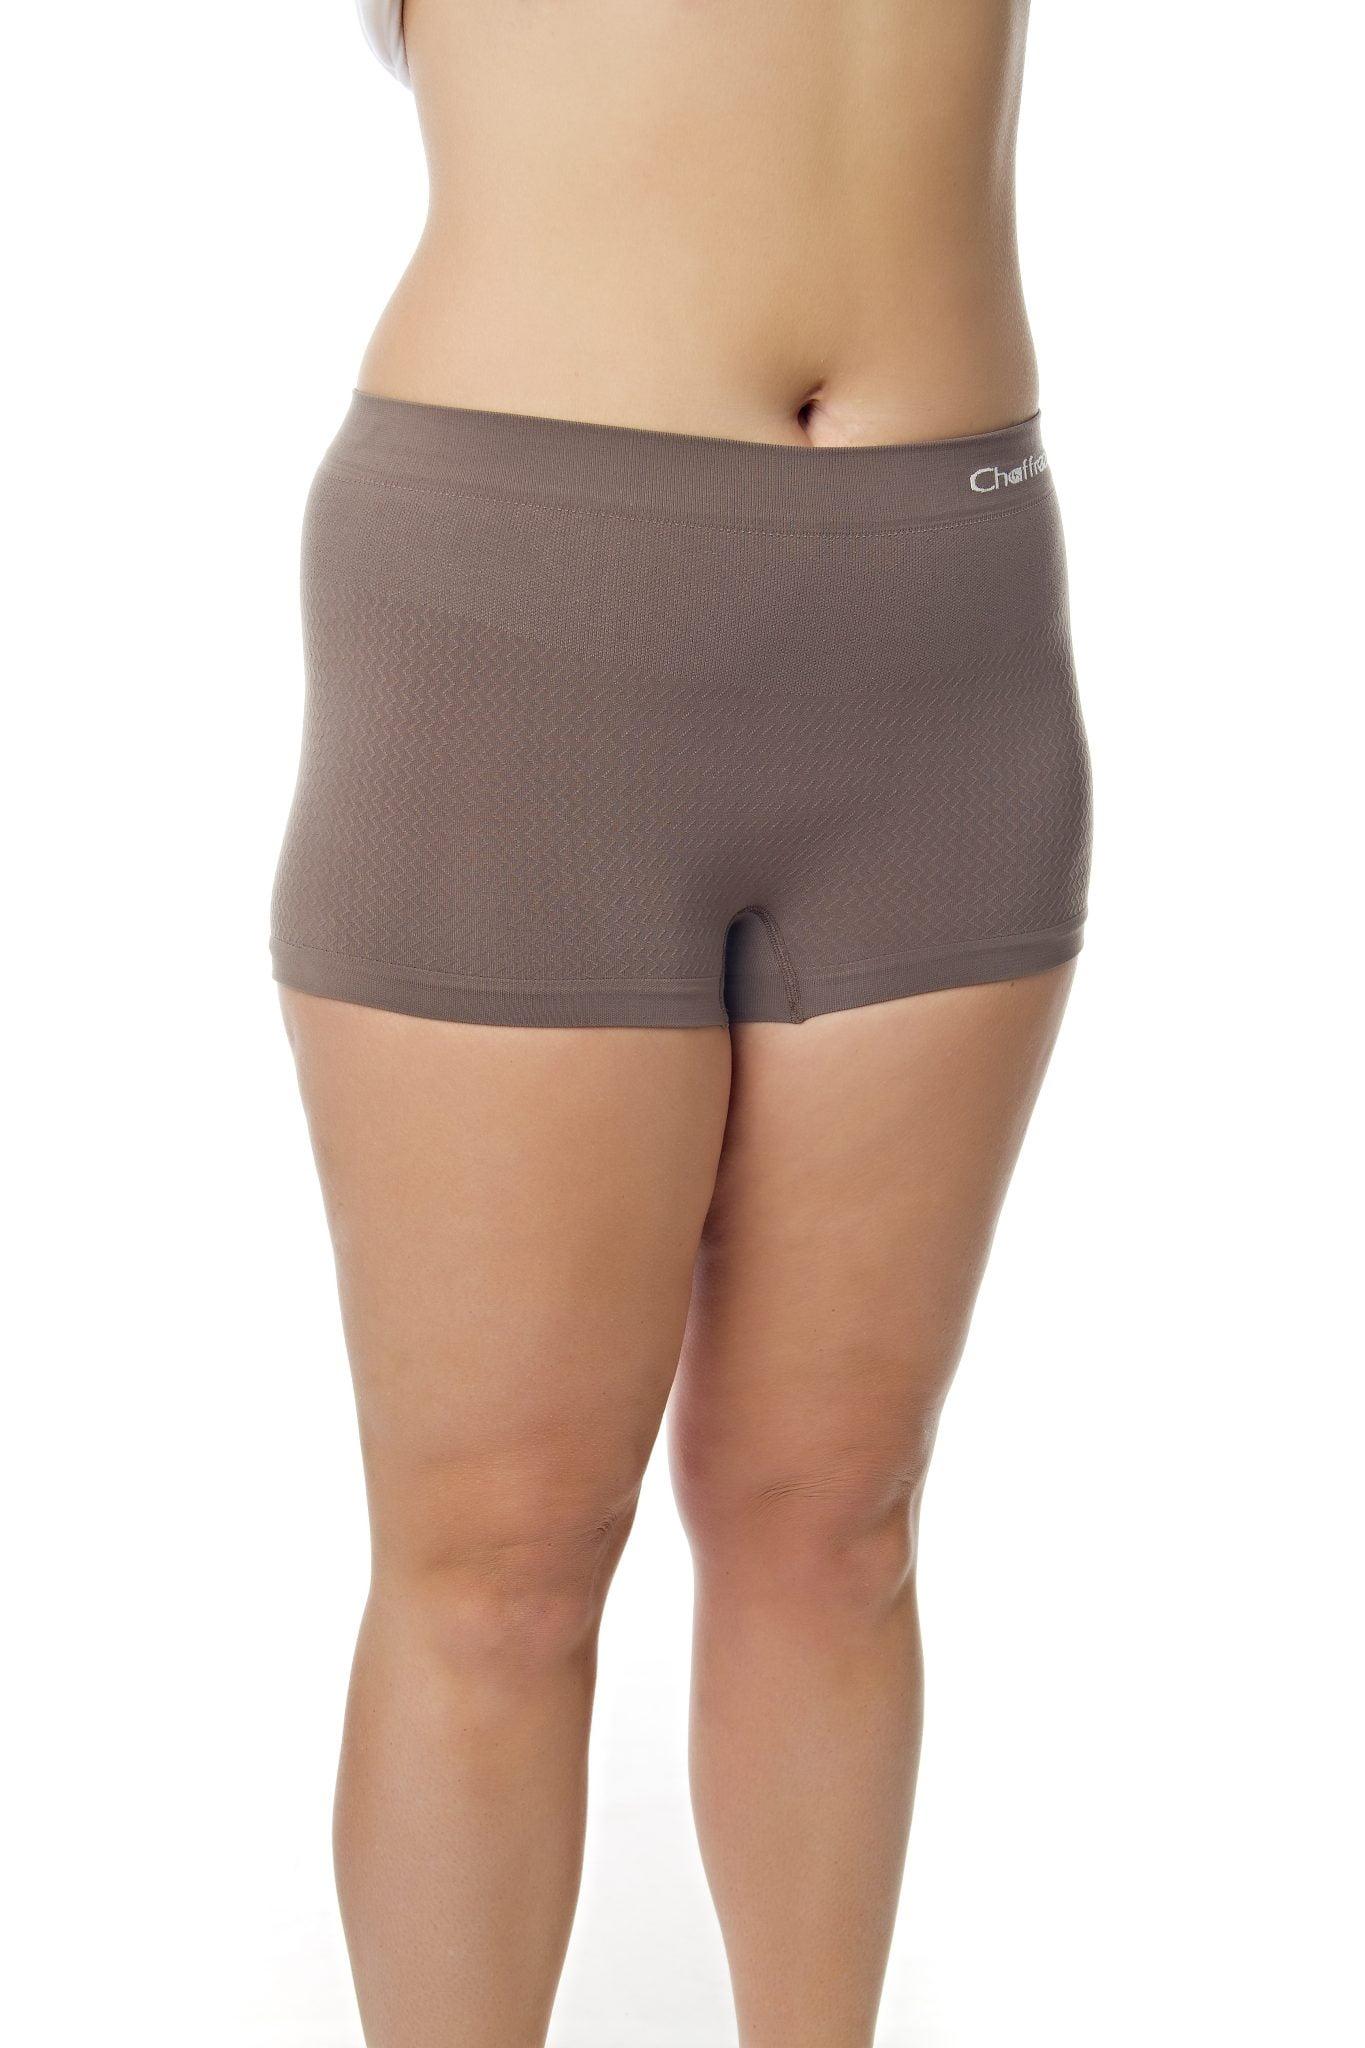 Chaffree boxer shorts for women